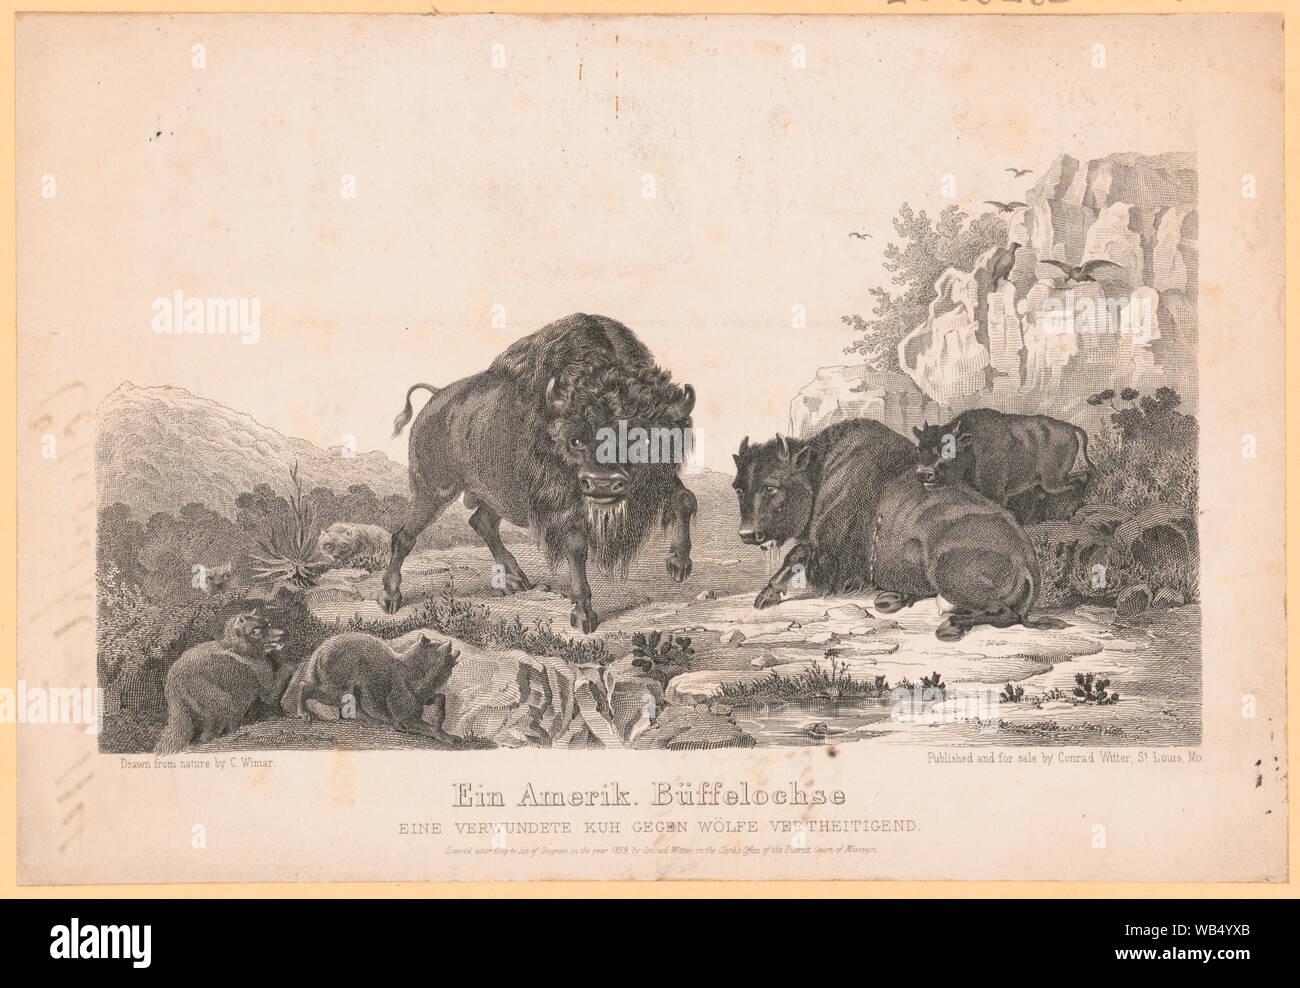 Ein  Amerik. buffelochse Stock Photo